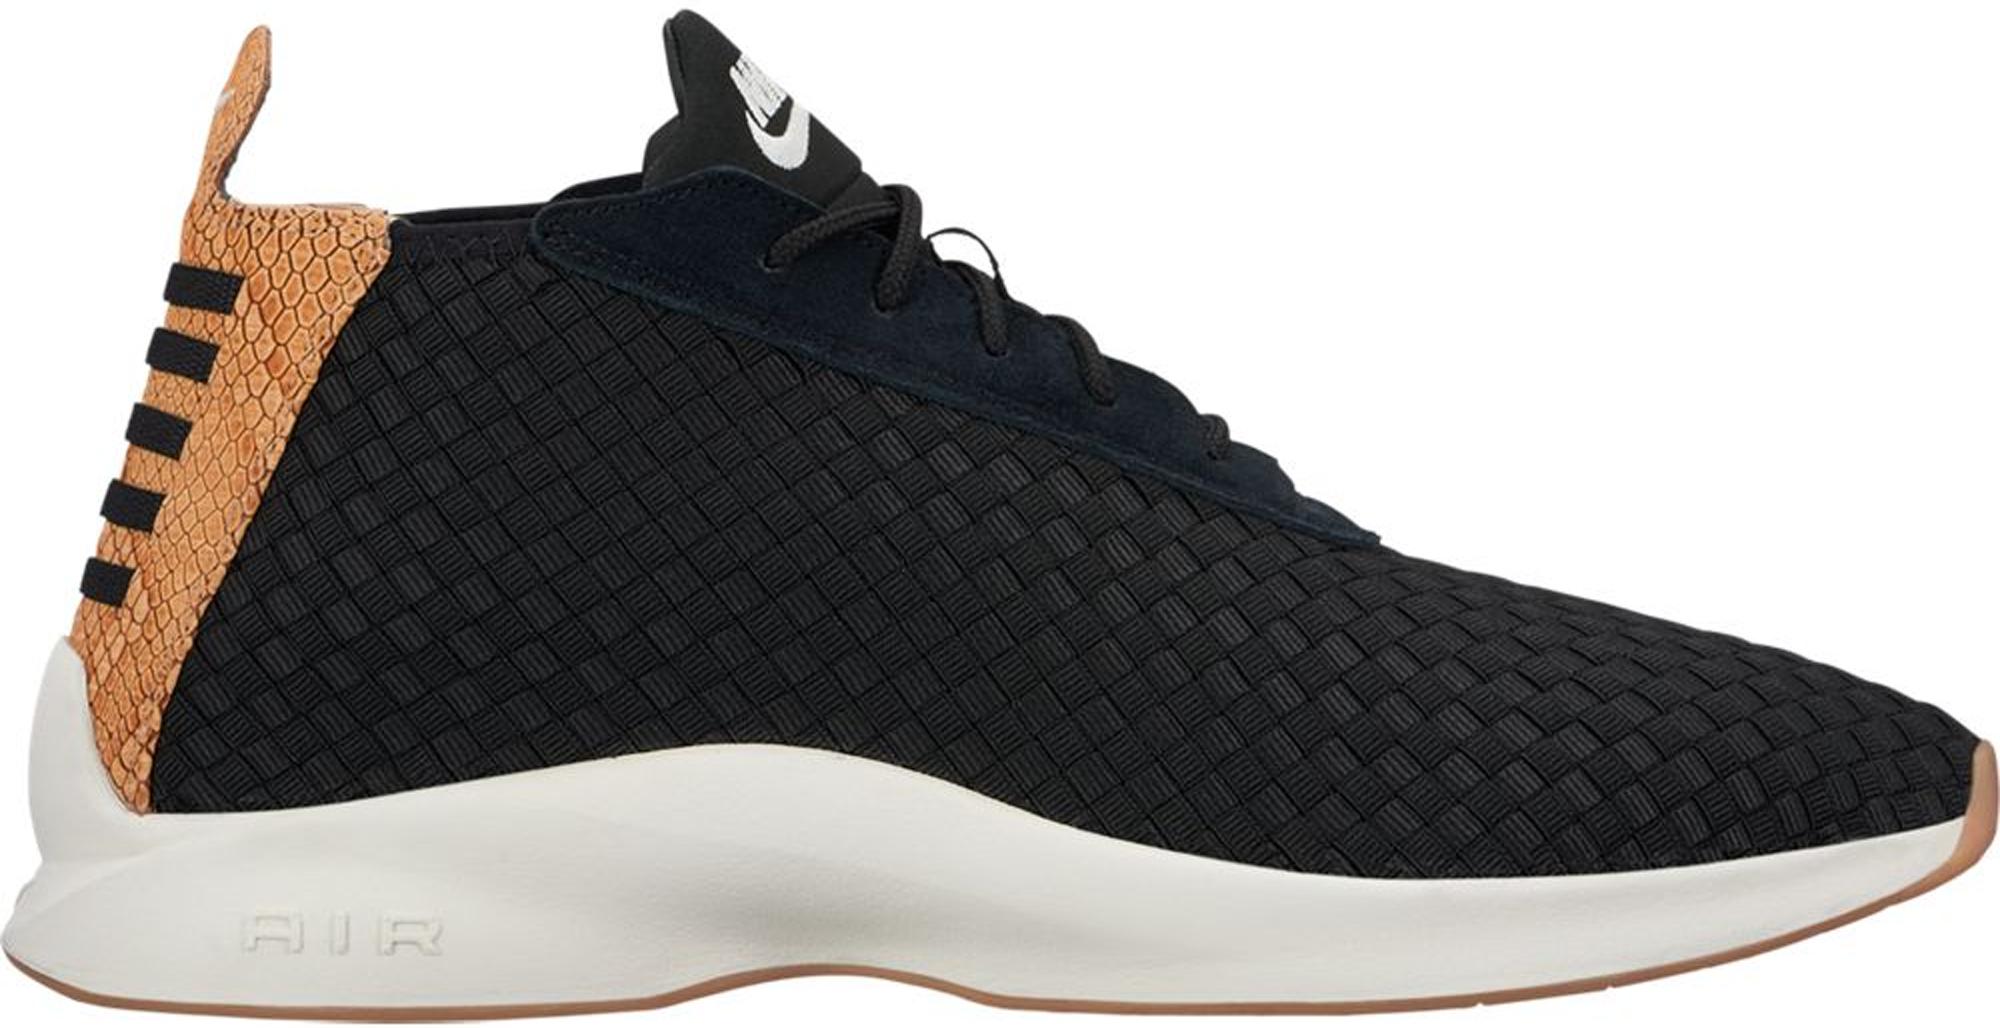 Nike Air Woven Boot Black Dark Russet